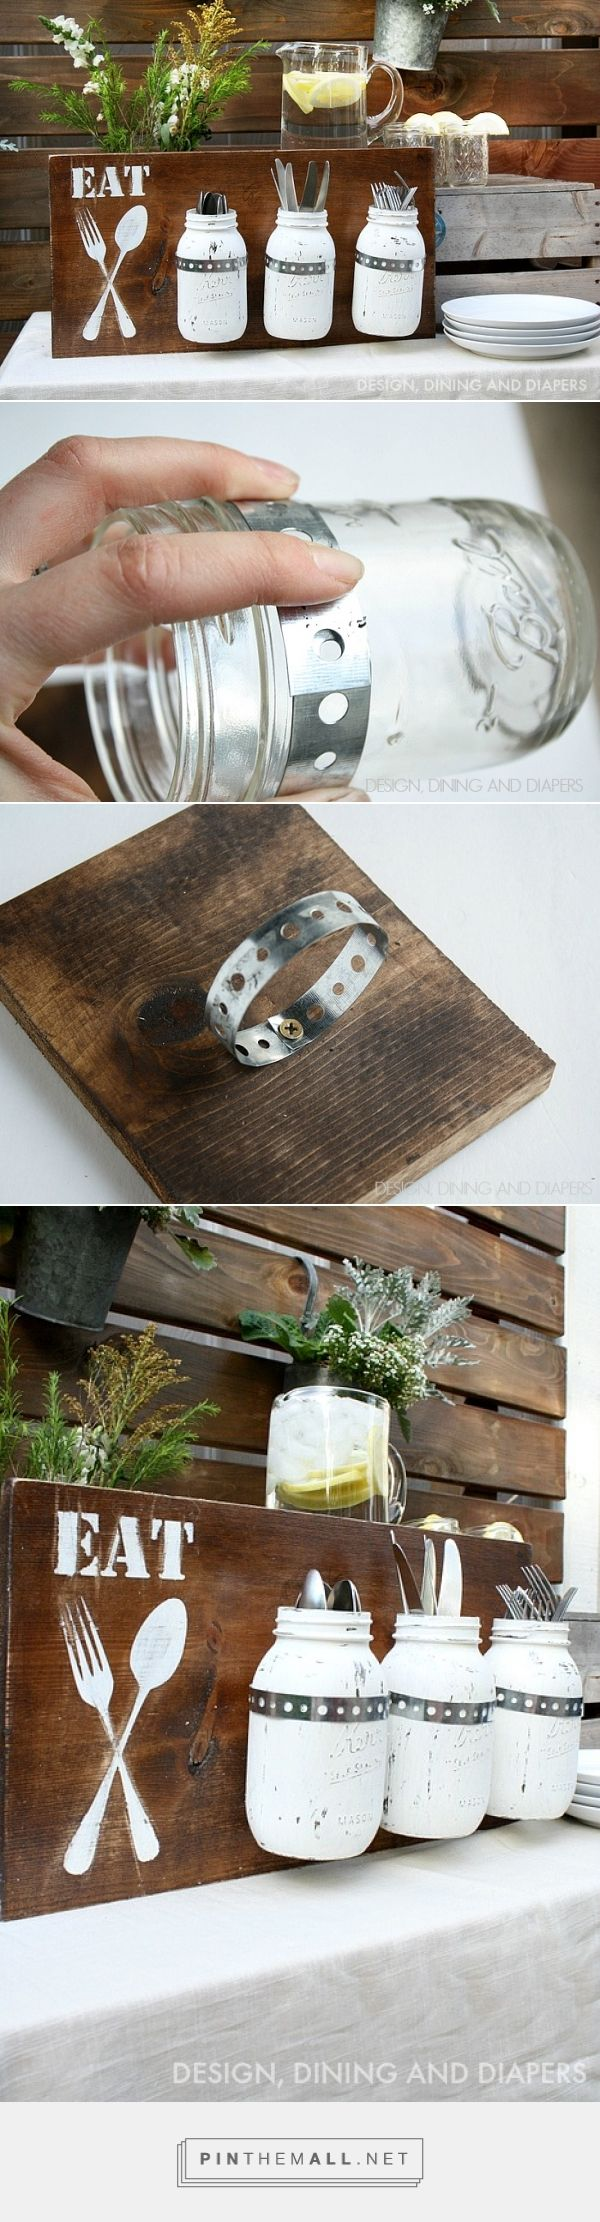 DIY Silverware Holder | Porta posate per la cucina con legno e barattoli riciclati... Via designdininganddiapers.com #FarmersXmasGifts #Christmas #Gift #Handmade #Homemade #Diy #Eat #Wood